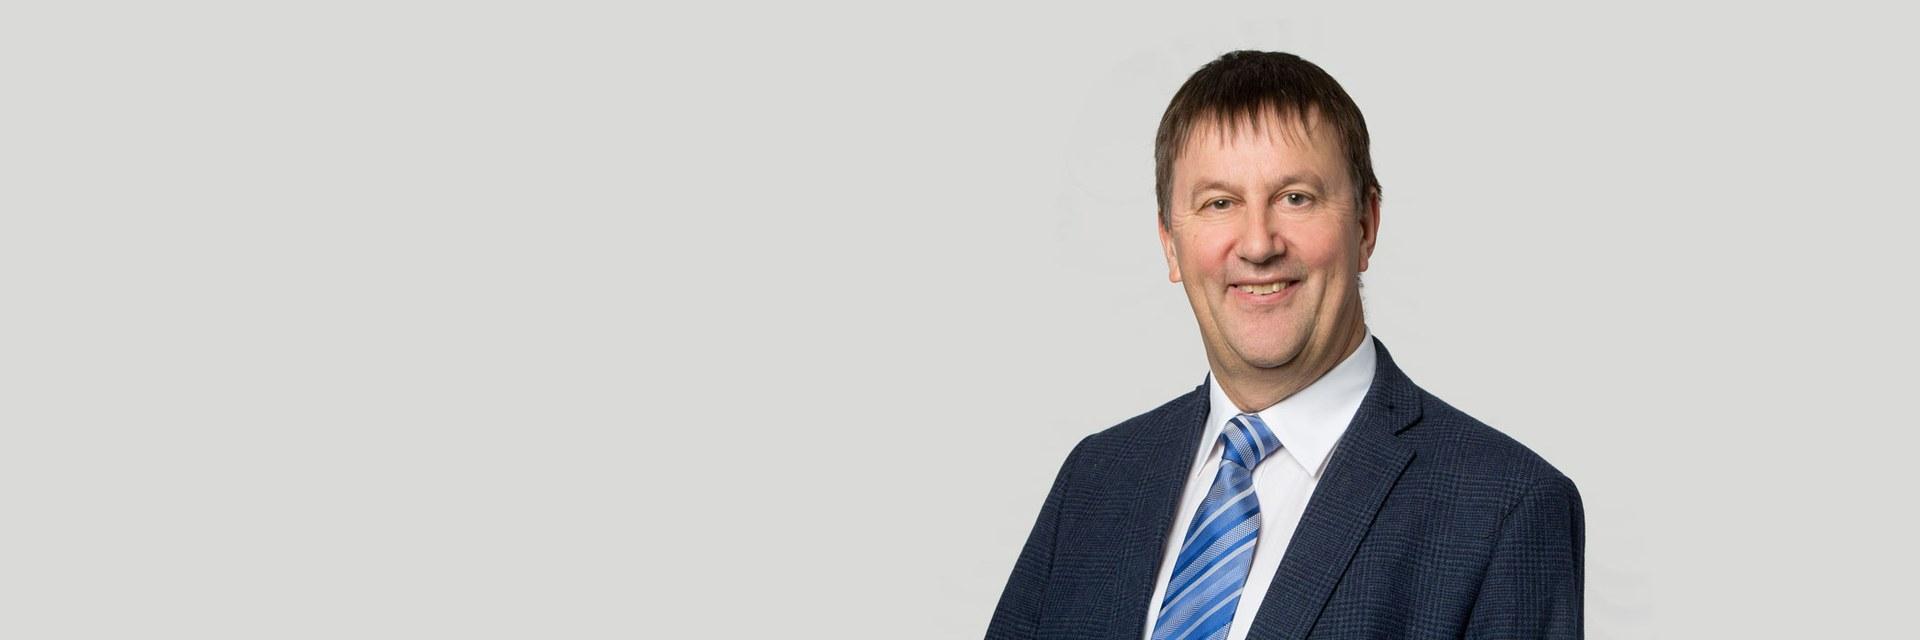 Prof. Pieter Jan Perrett